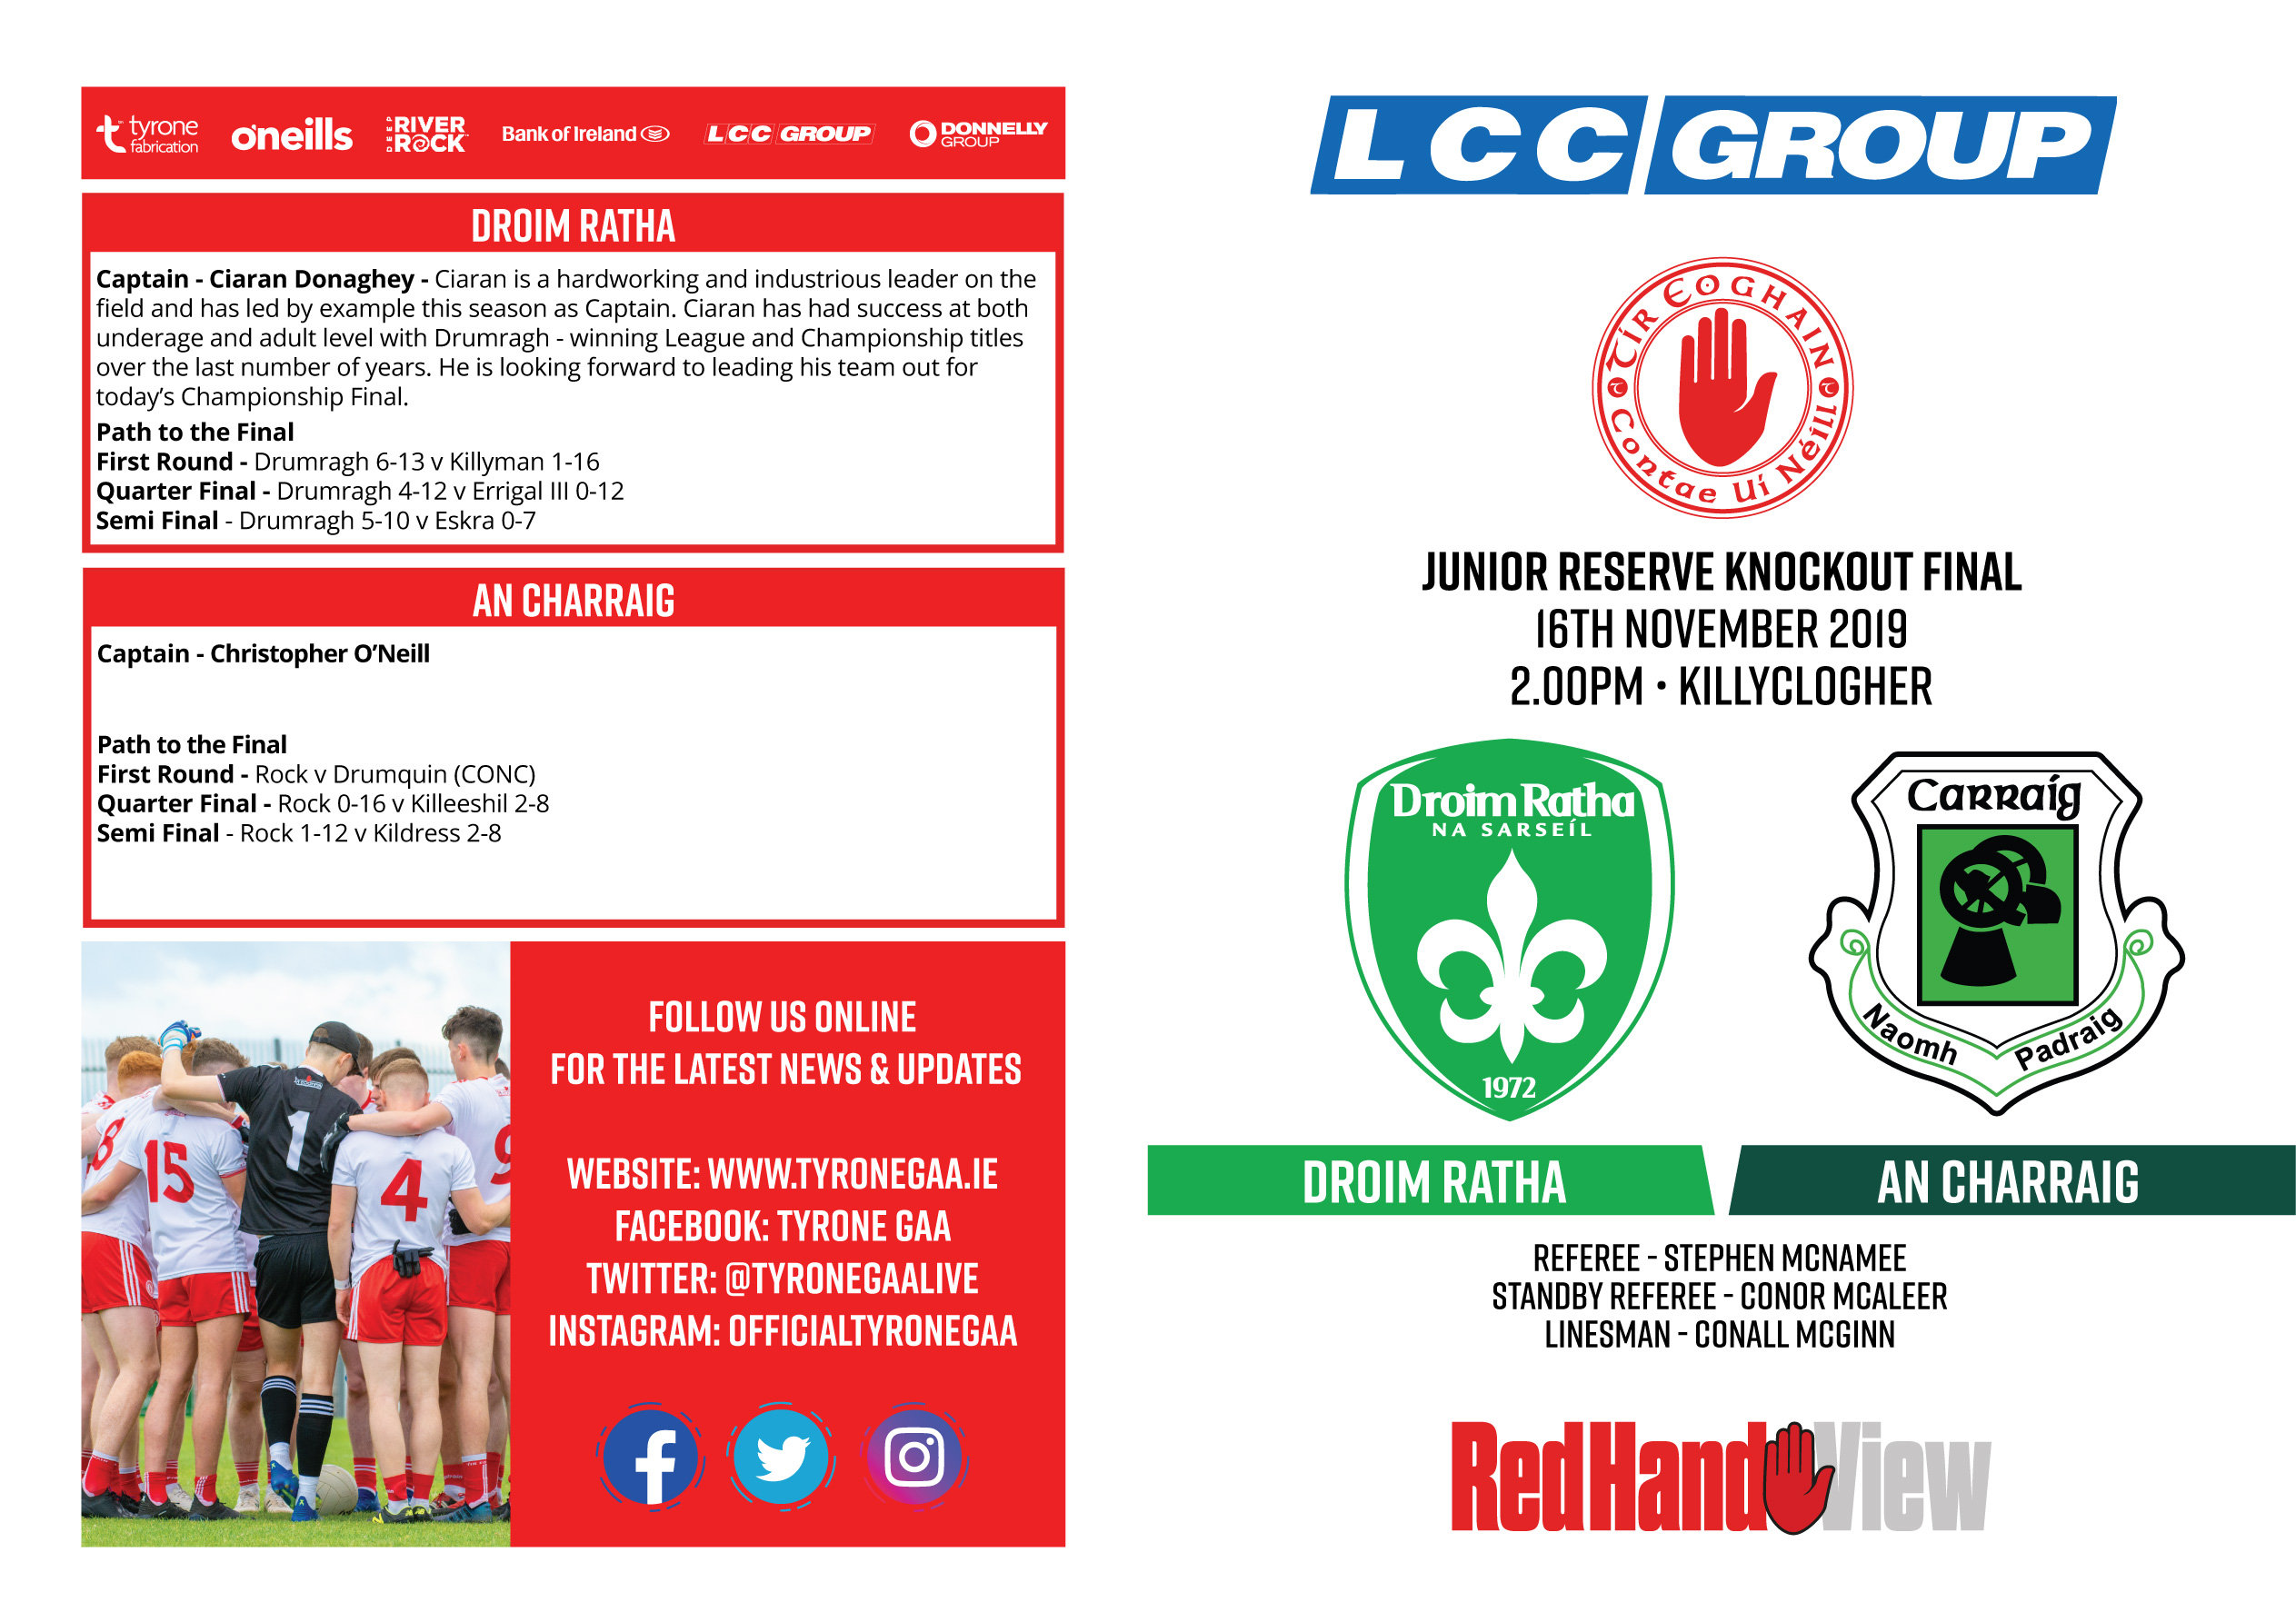 Reserve Championship Final Programme